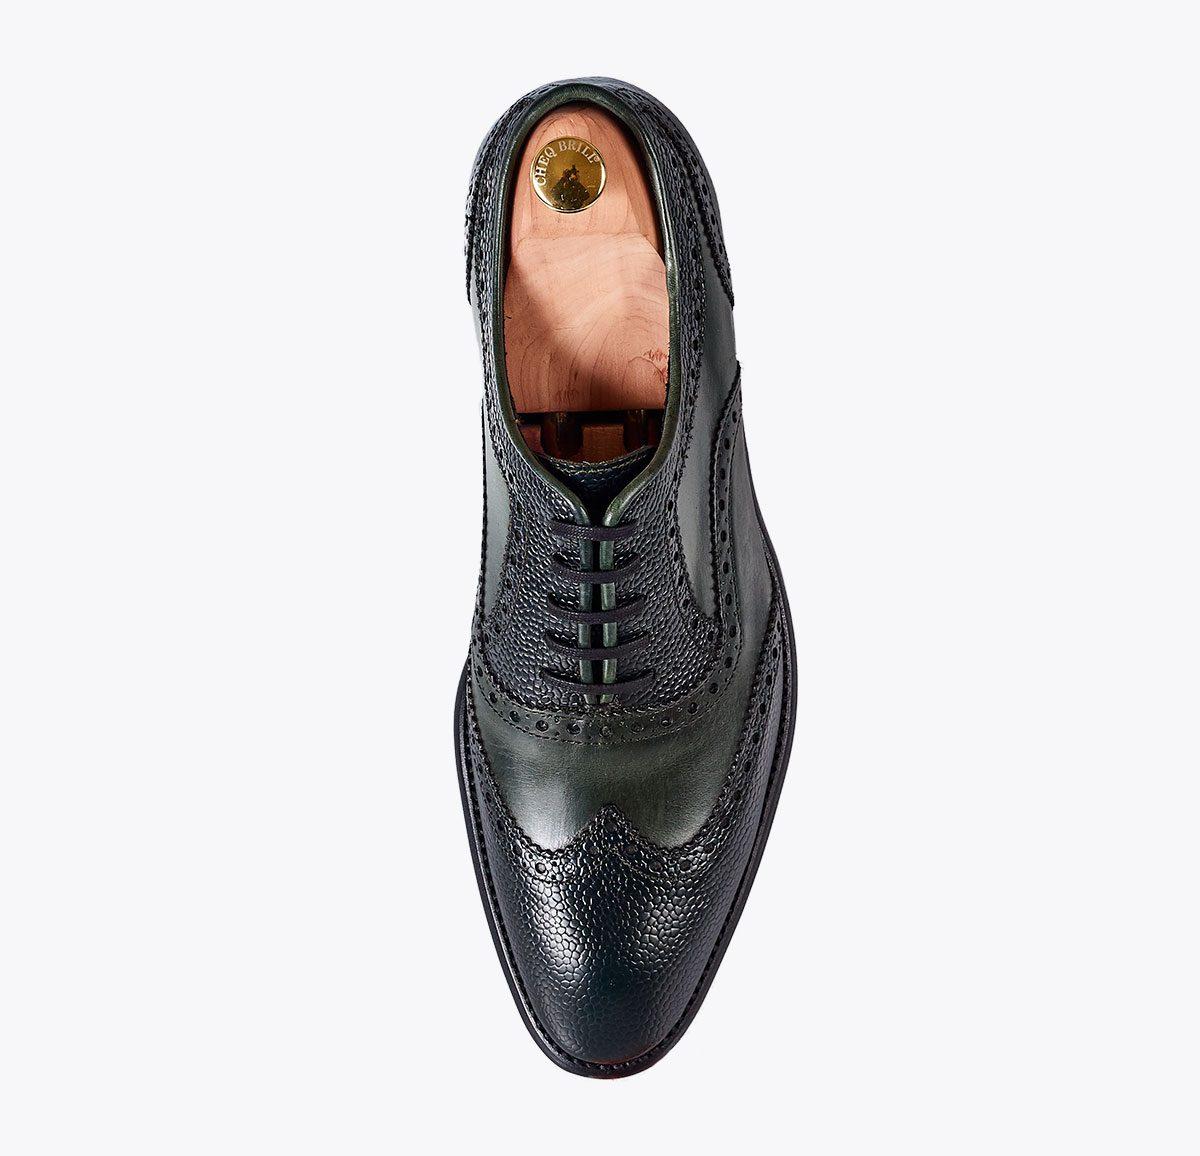 Zapato Málaga hecho a mano en mandalashoes, Santanyí Mallorca. Hand made shoes. Nach Mass Schuhe